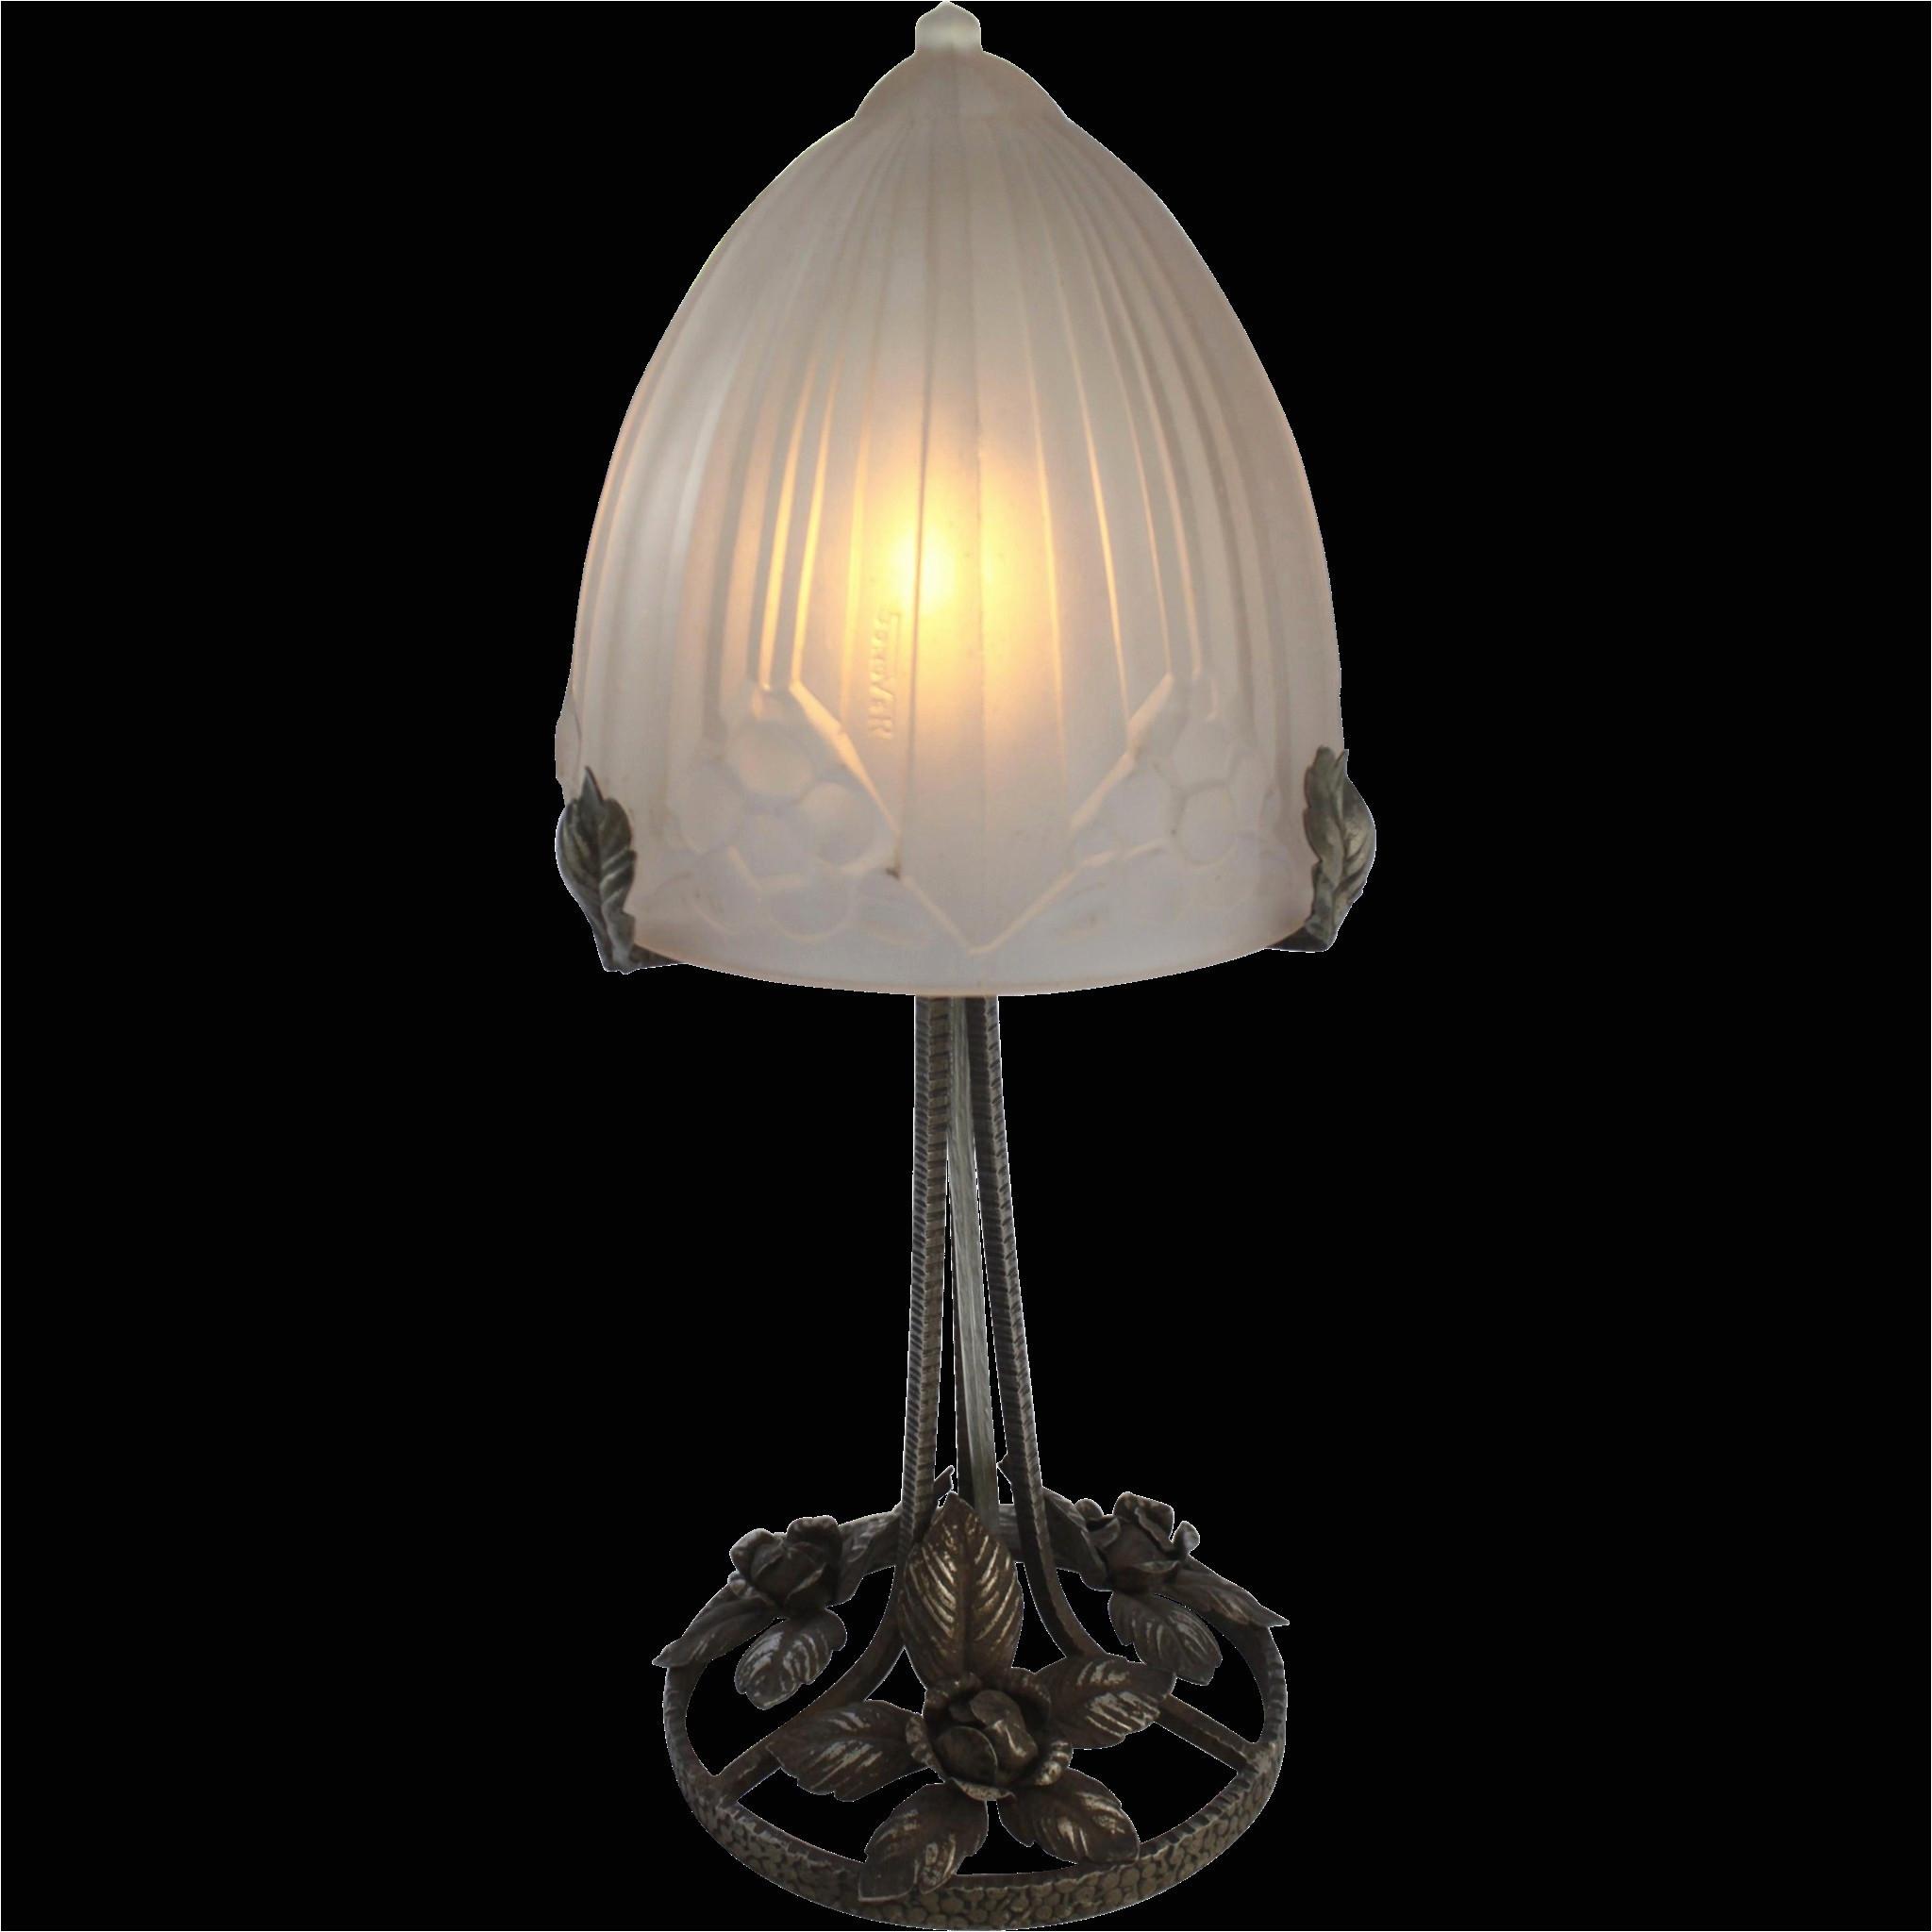 Ikea Spotlight Lamp Haut 40 De Spot A Led Scha¨me